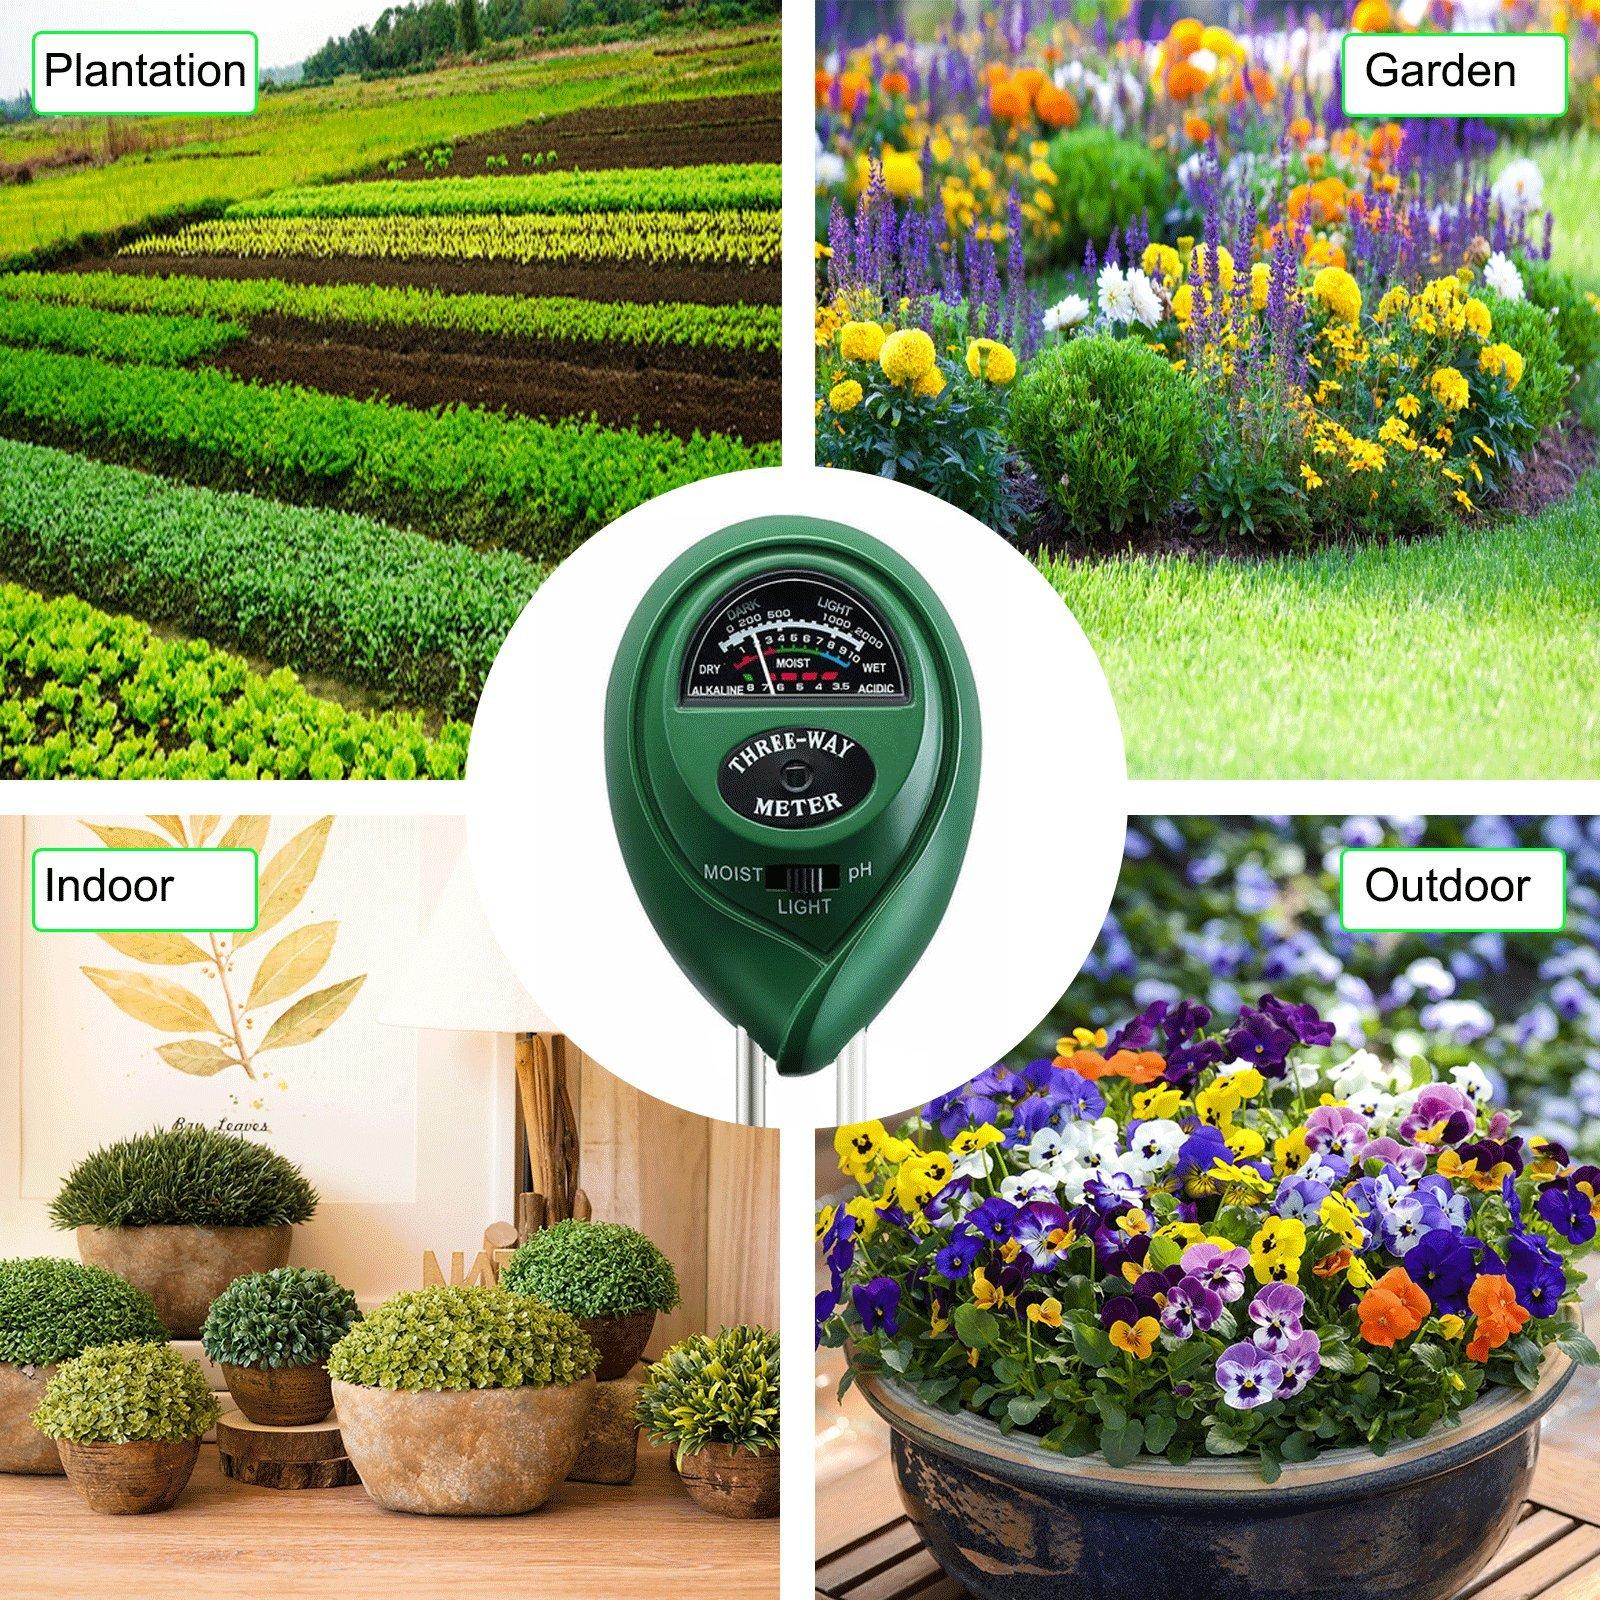 Banfeng Soil pH Meter, 3 in 1 Soil Tester Kit Gardening Tools PH, Light & Moisture,Great Garden, Farm, Lawn, Indoor & Outdoor (No Battery Needed)